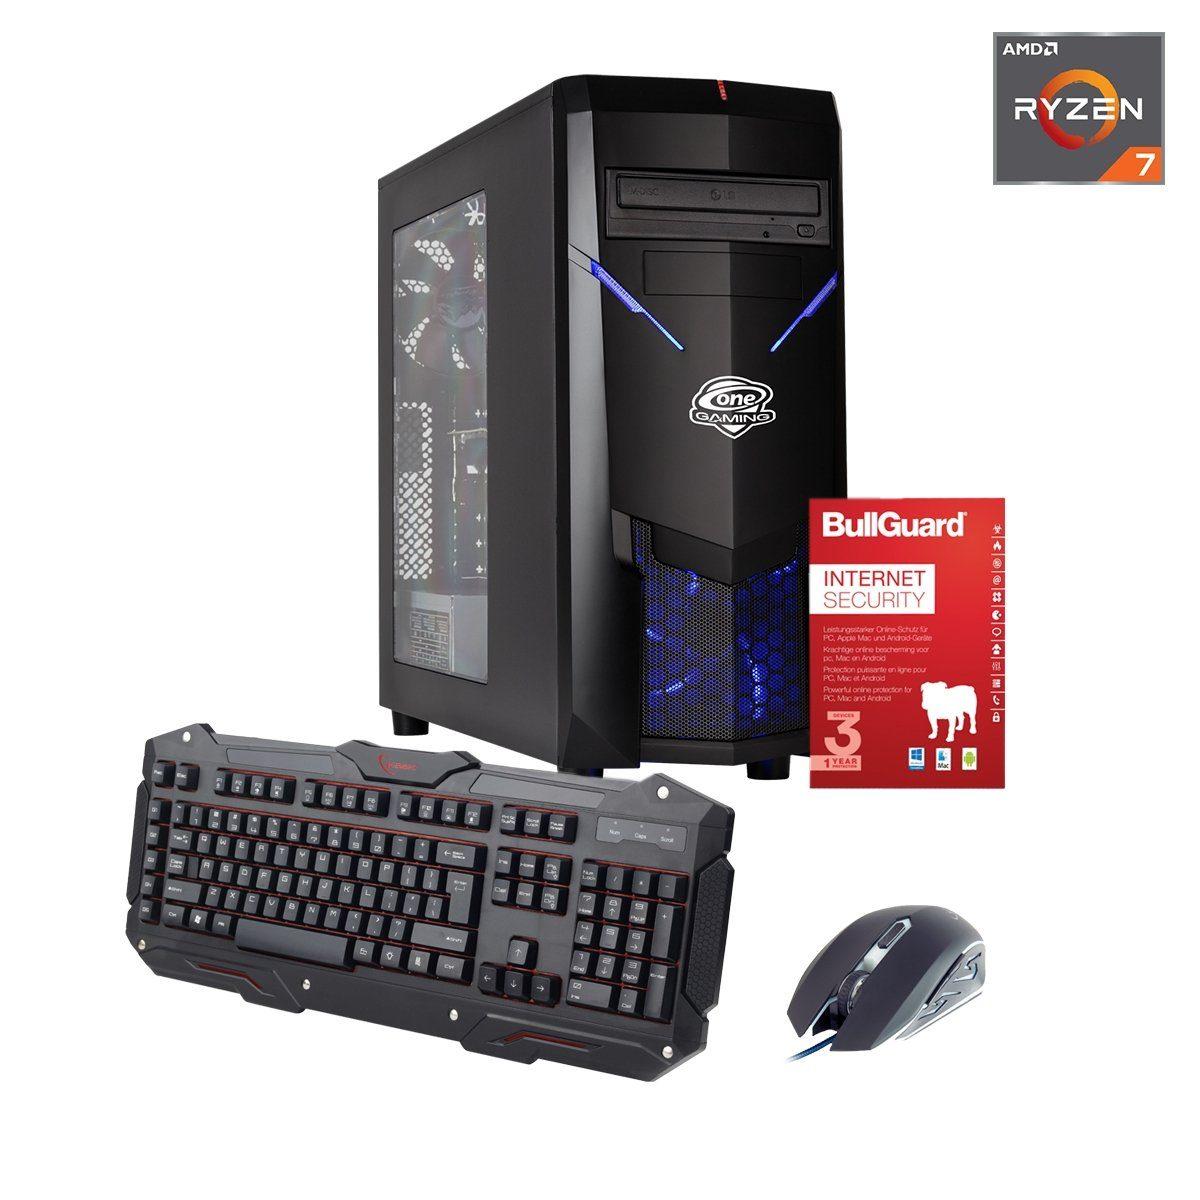 ONE GAMING PC, Ryzen 7 1800X, GeForce GTX 1080, 16GB DDR4 RAM »PC 44640«